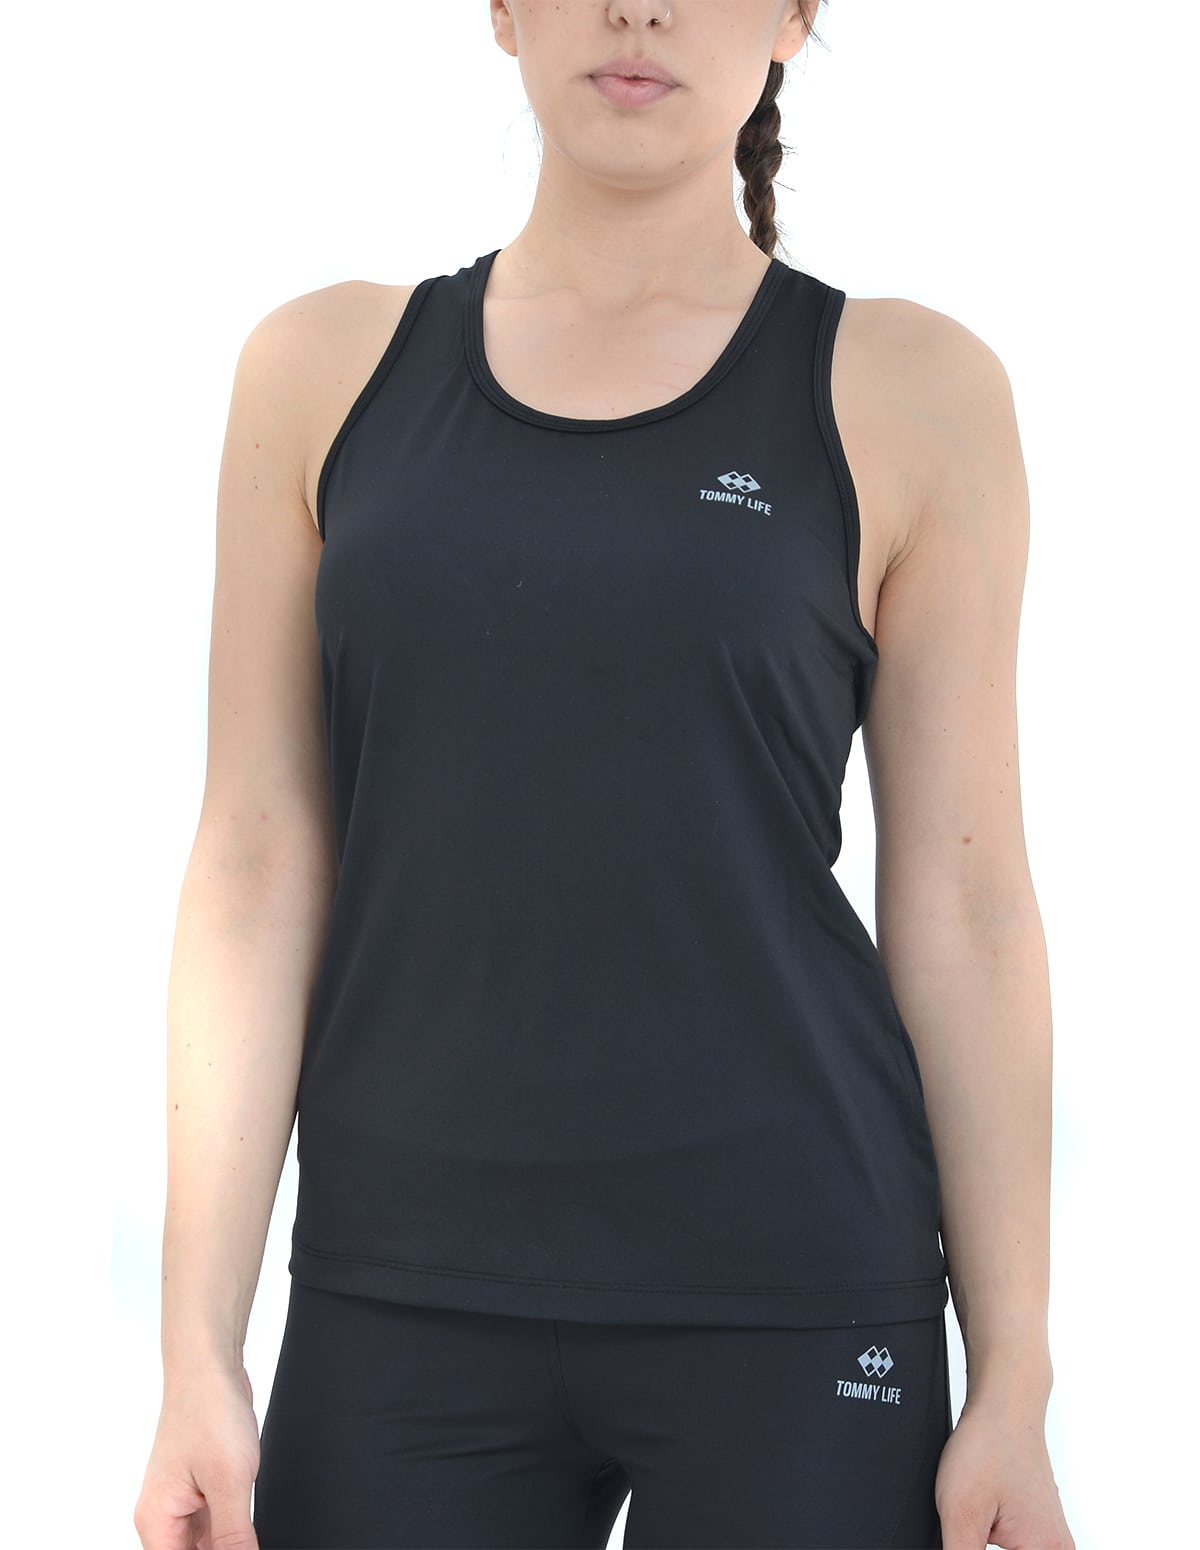 740e5e53f788 Γυναικείο αθλητικό μπλουζάκι σε μαύρο χρώμα - vactive.gr